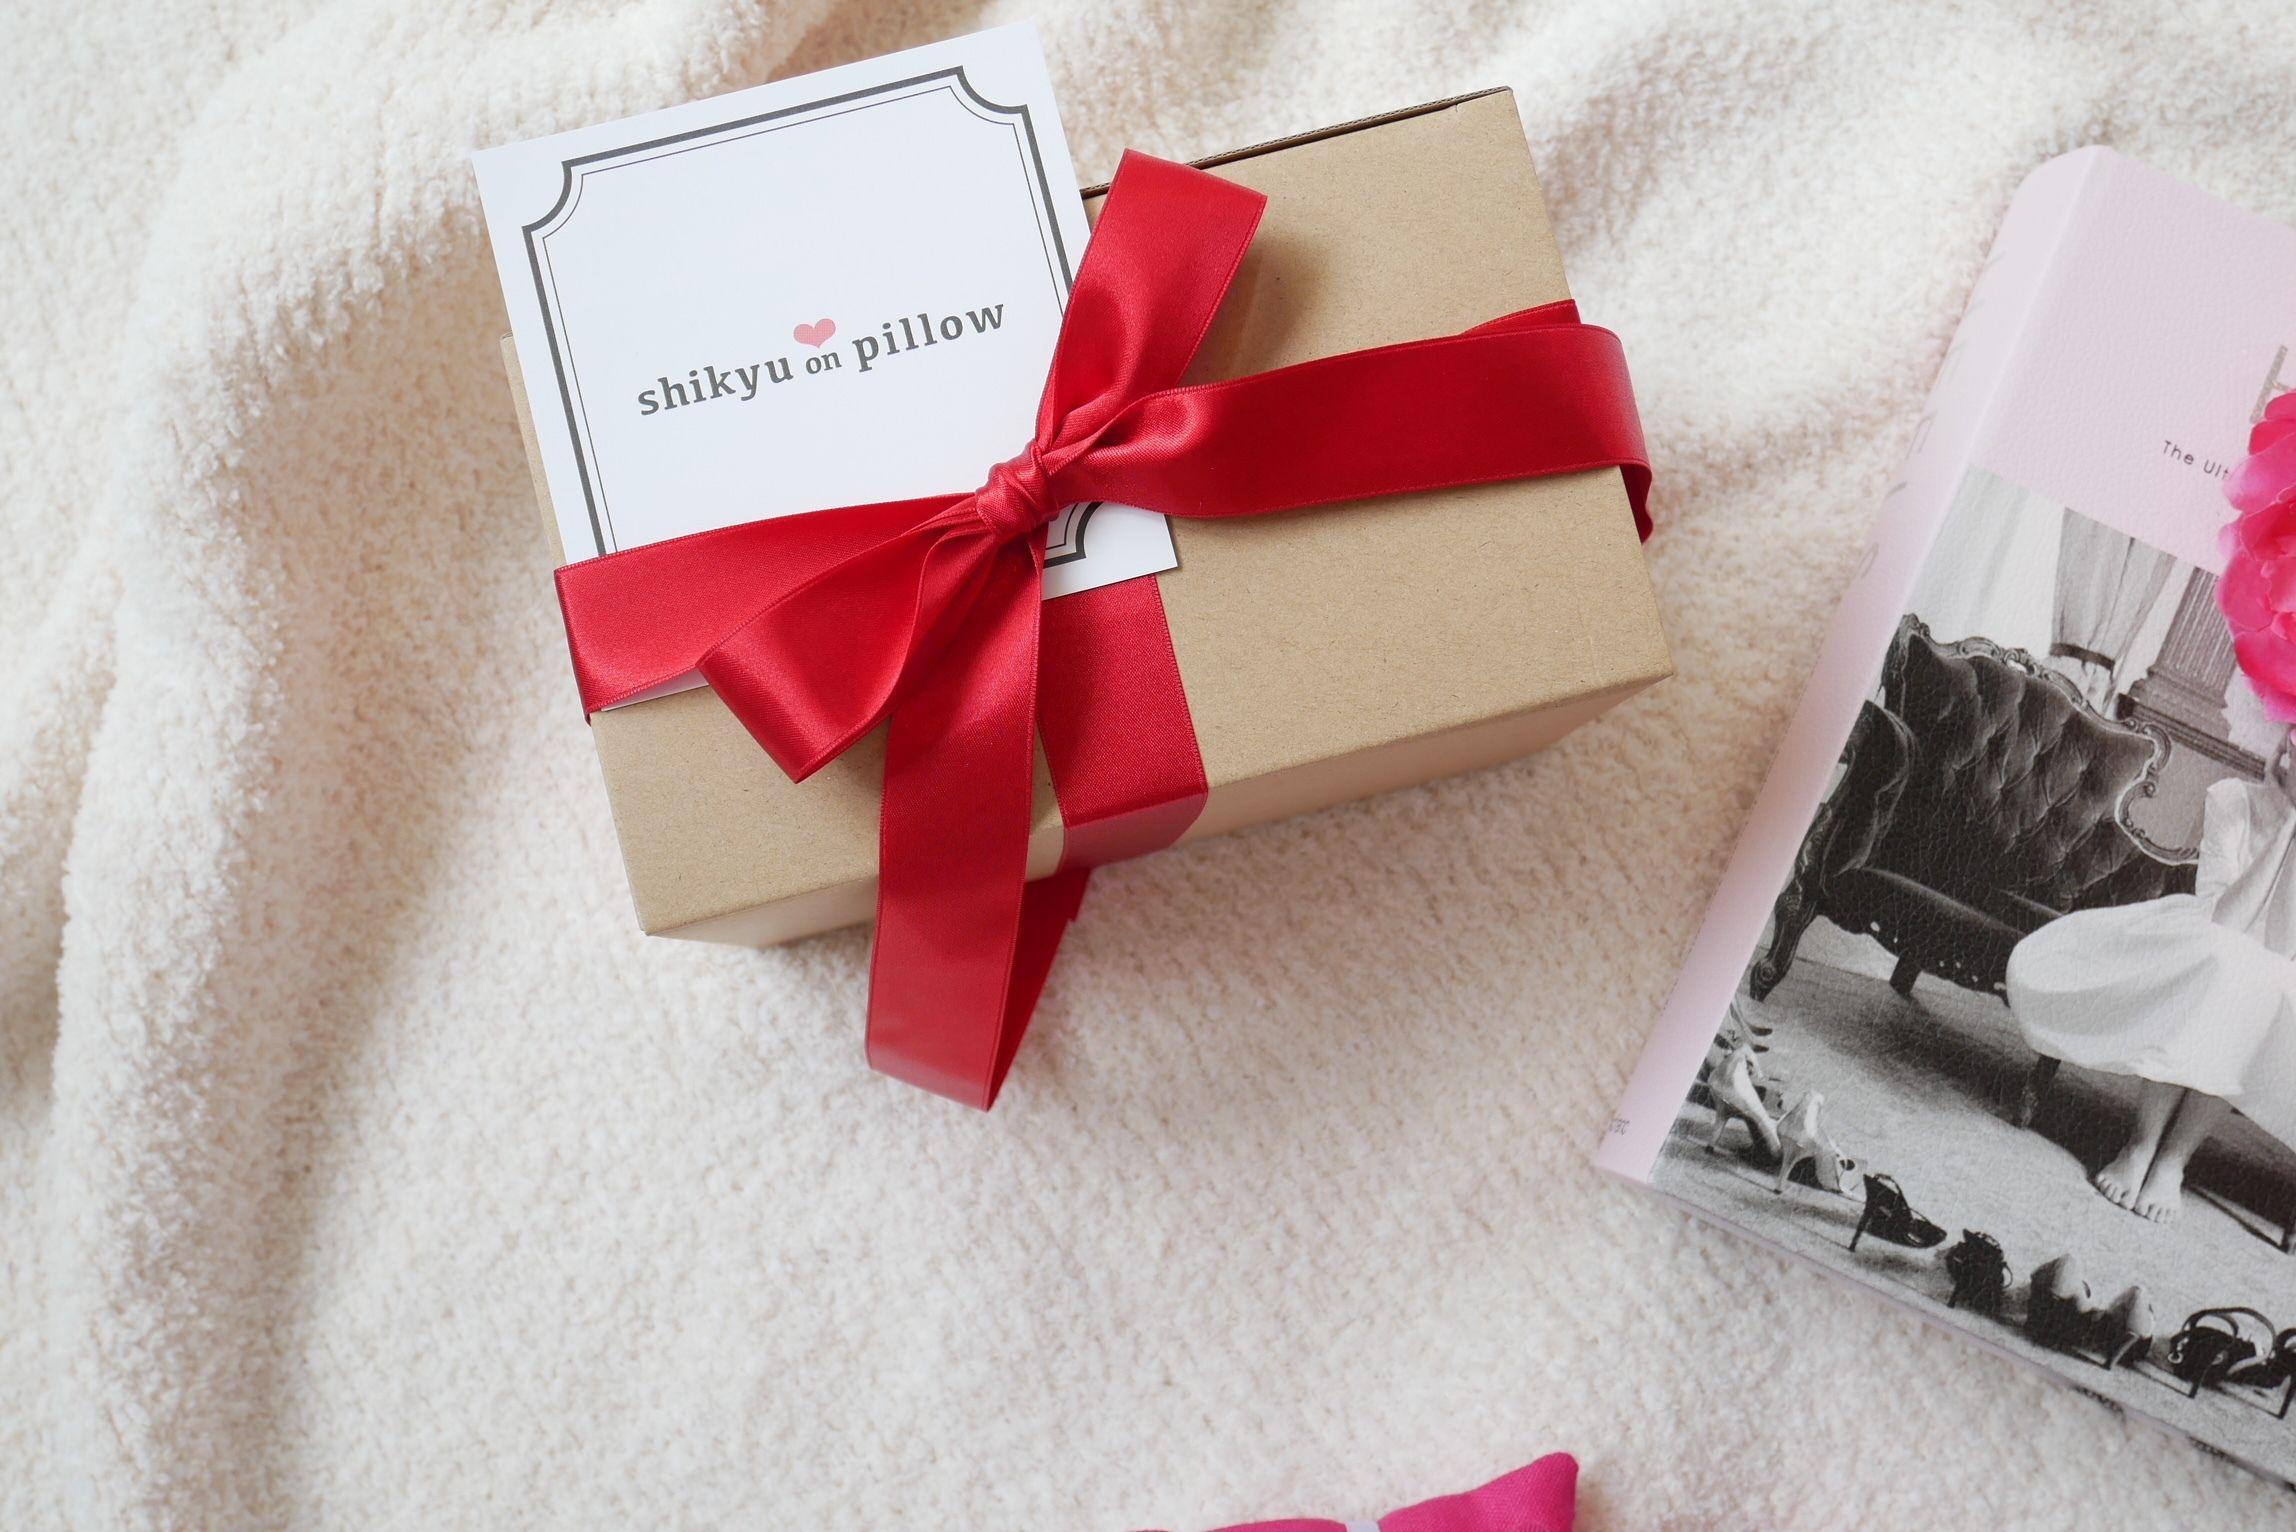 Gift boxrich redribbon leclaire boutique gift boxrich redribbon leclaire boutique negle Choice Image